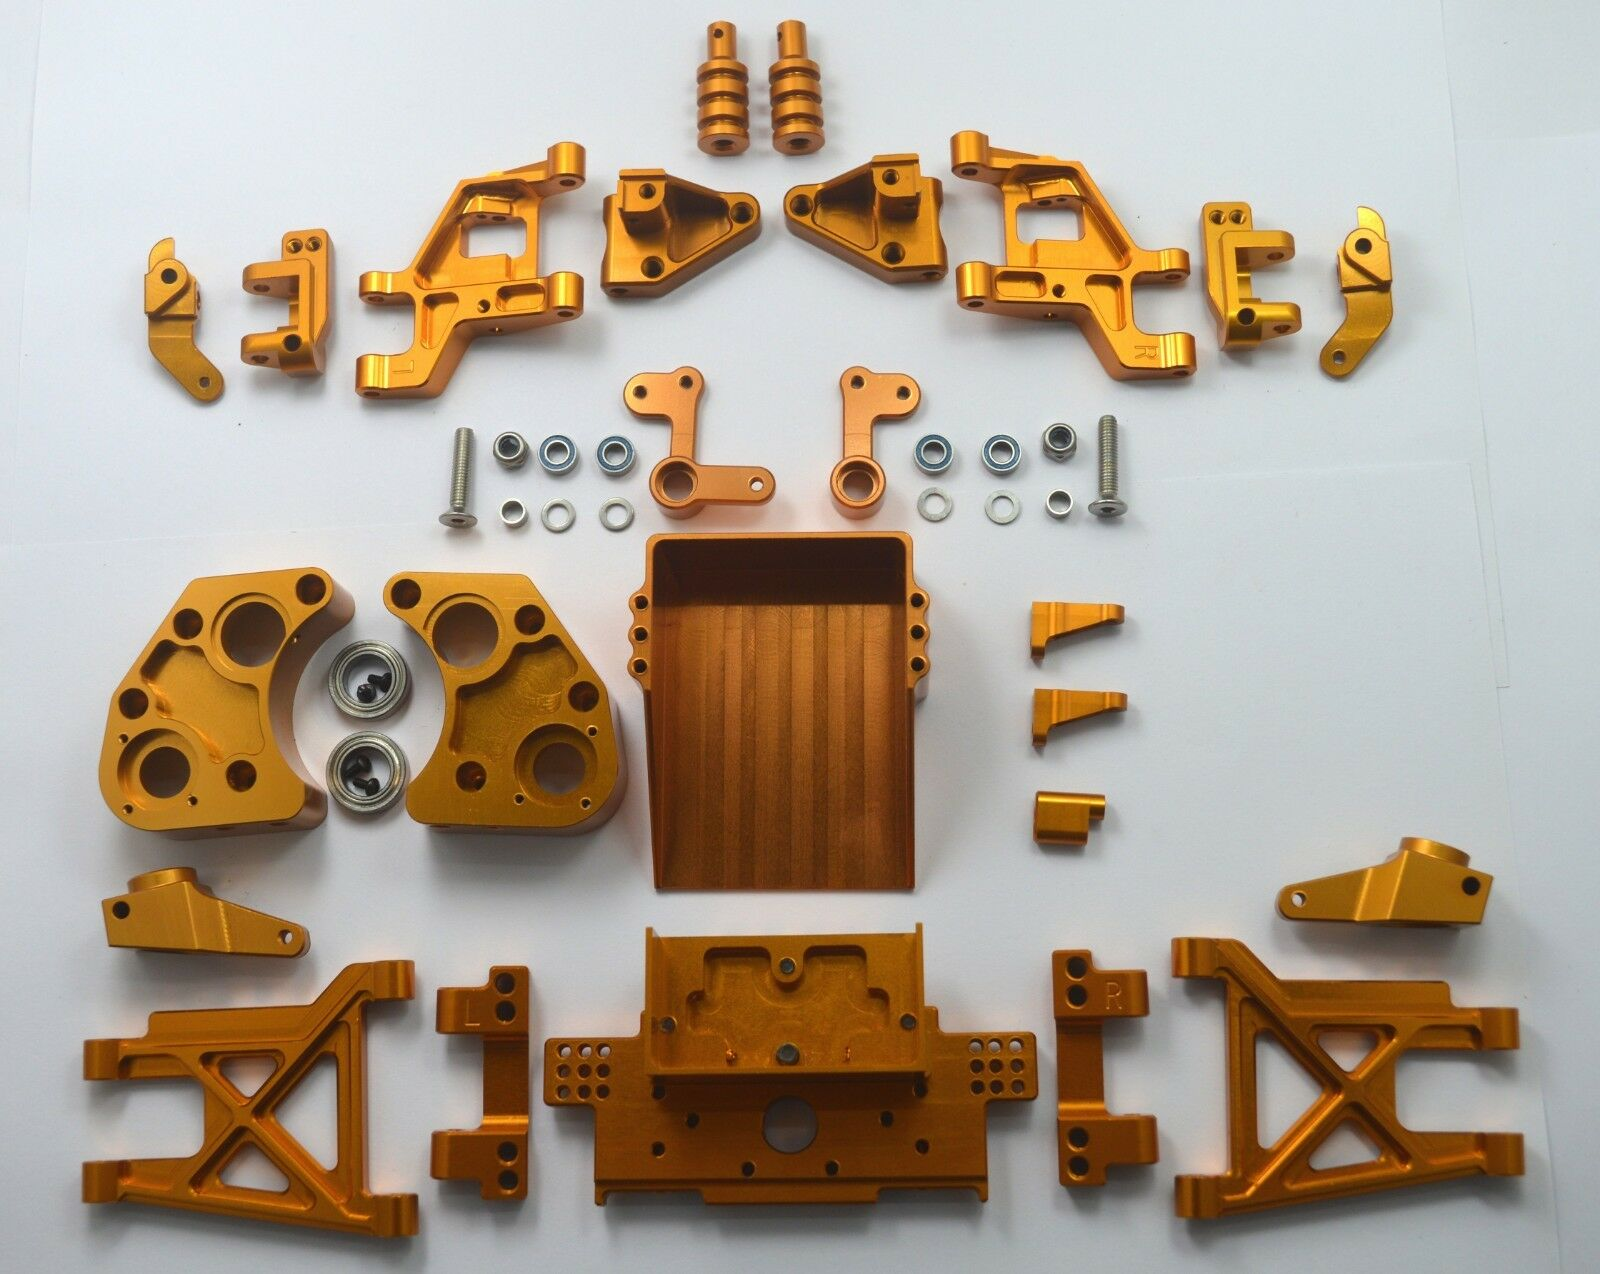 Dhawk Racing Aluminum Conversion Kit oro For  squadra Associated RC10 classeic Kit  senza esitazione! acquista ora!